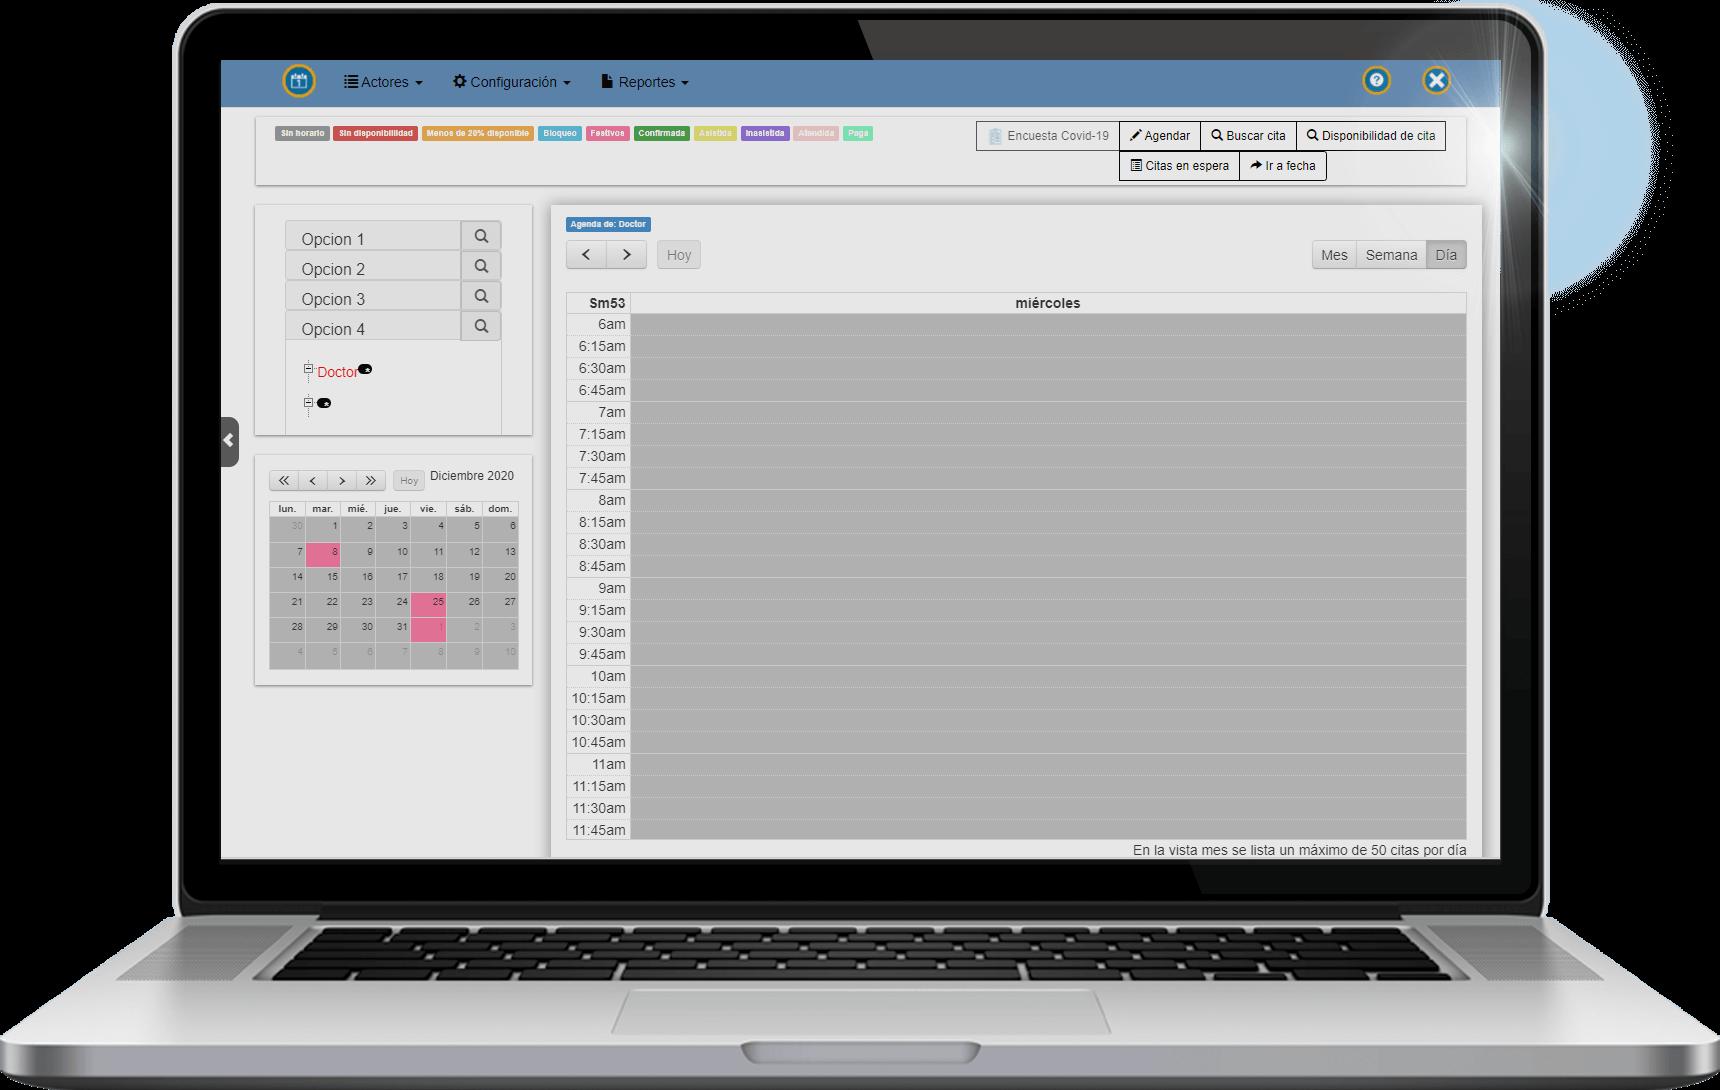 Módulo de agenda, HiMed Web Software de historias clínicas